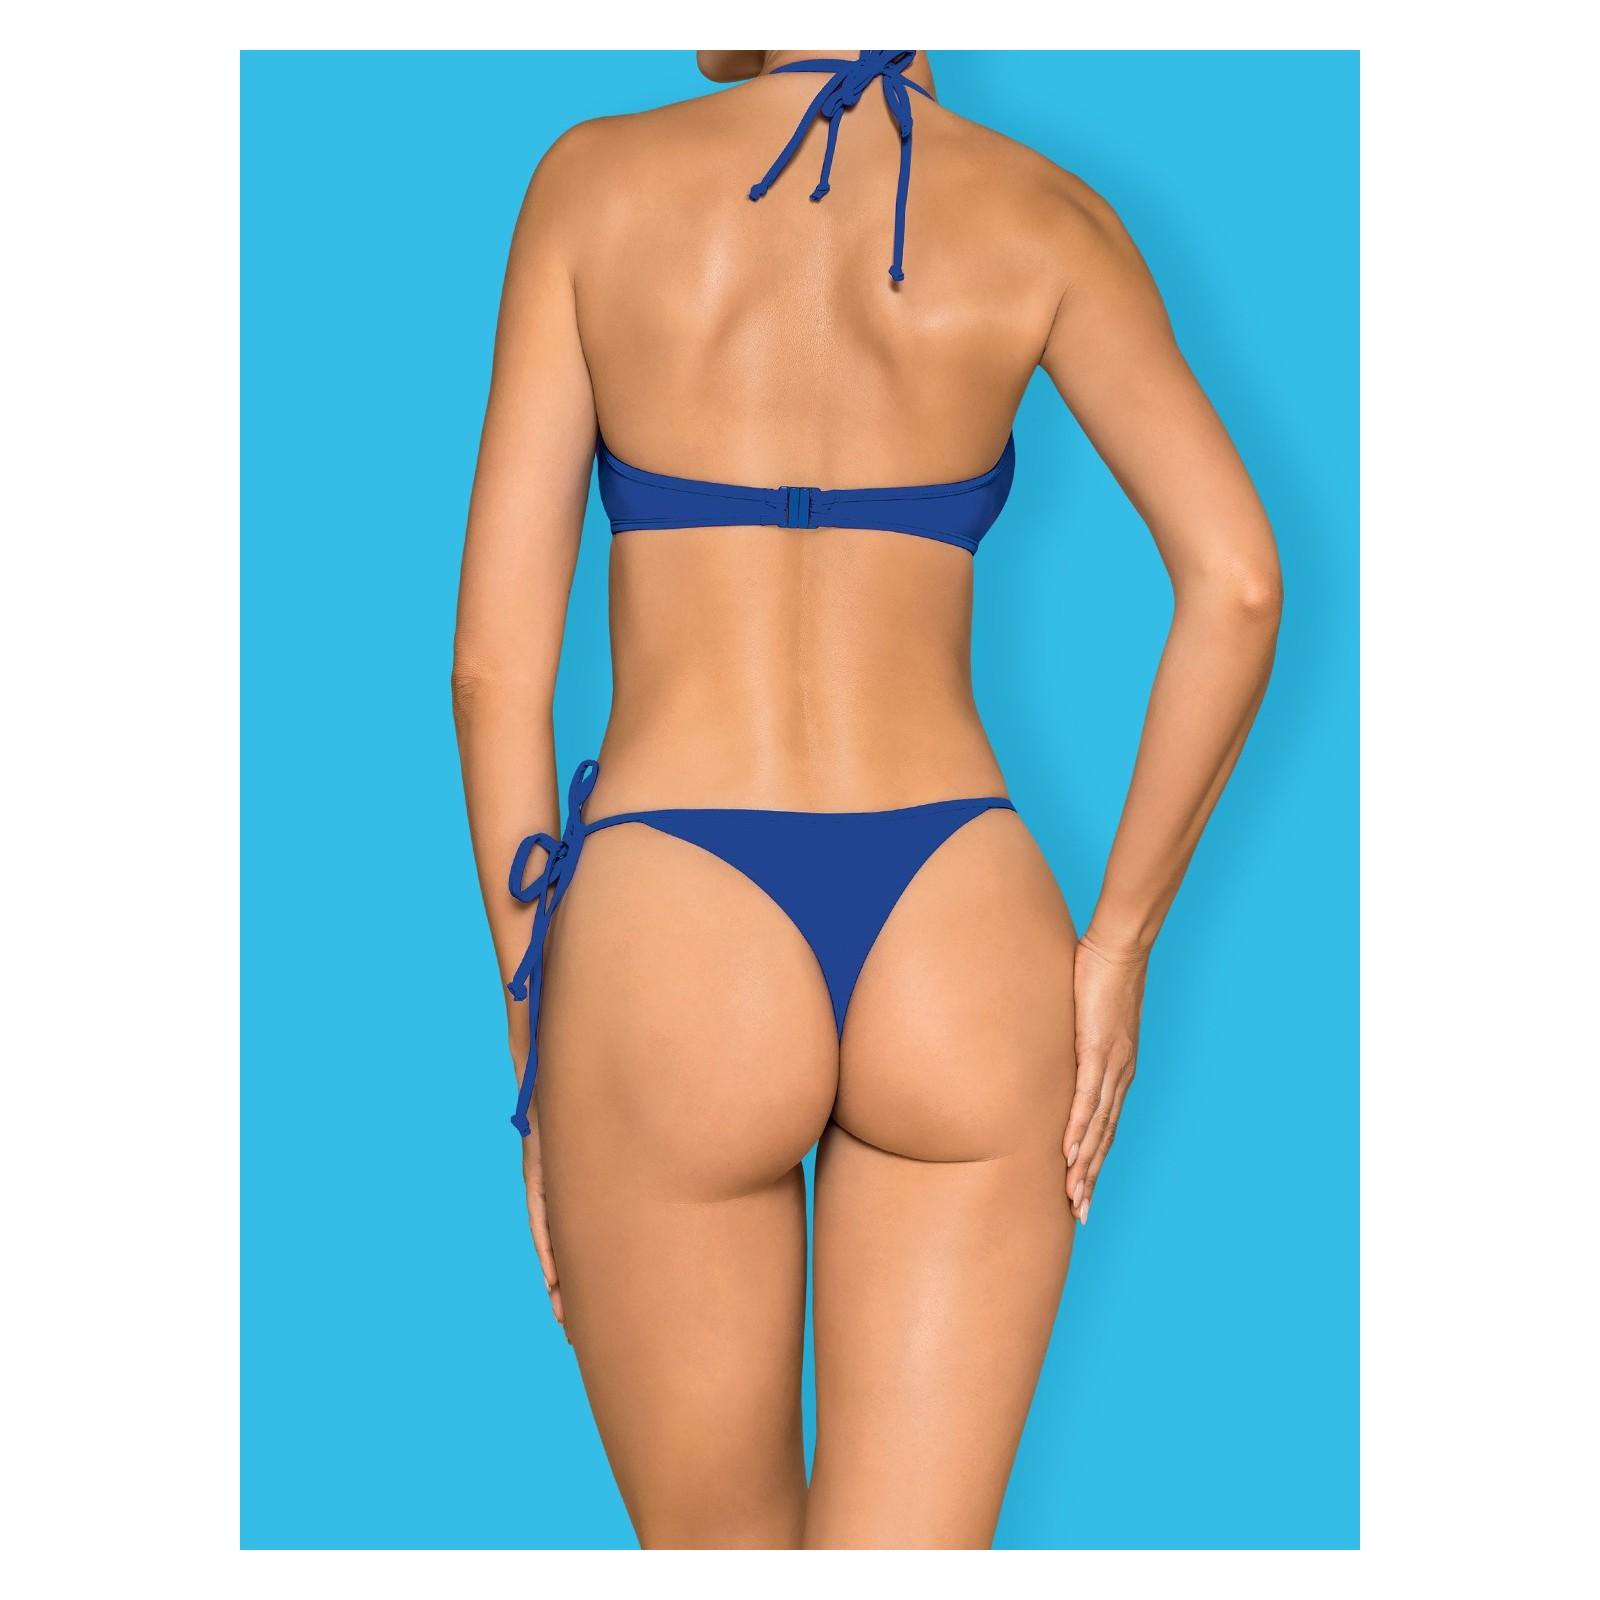 Bikini Costarica blau - 2 - Vorschaubild